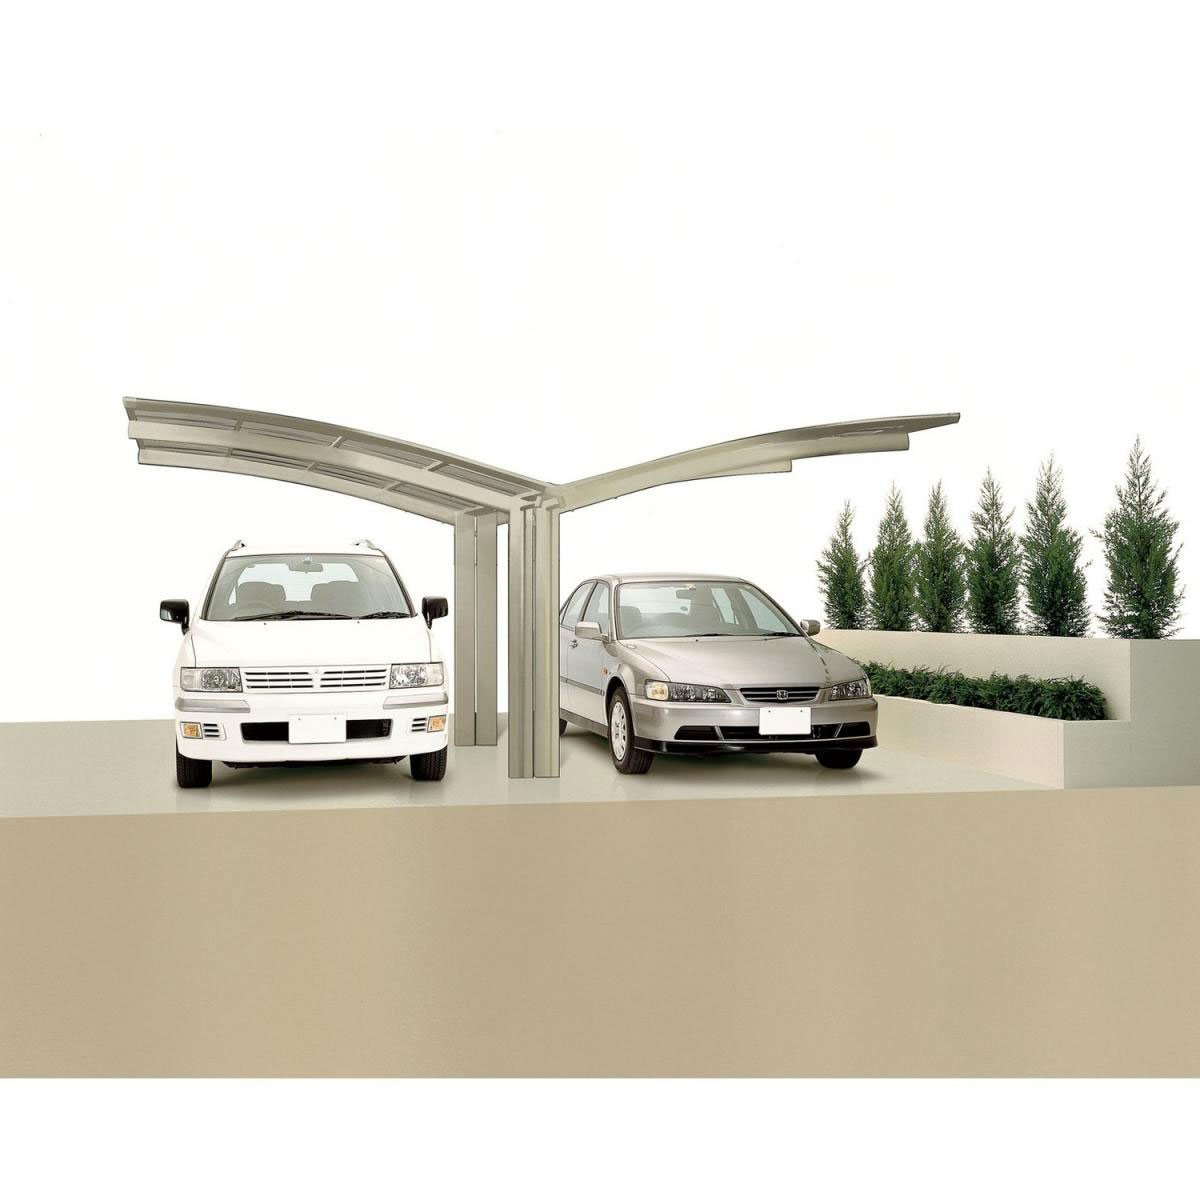 "Carports - Carport Alu ""Portoforte 80 Y Ausführung"" Edelstahl Look Edelstahl  - Onlineshop Hellweg"